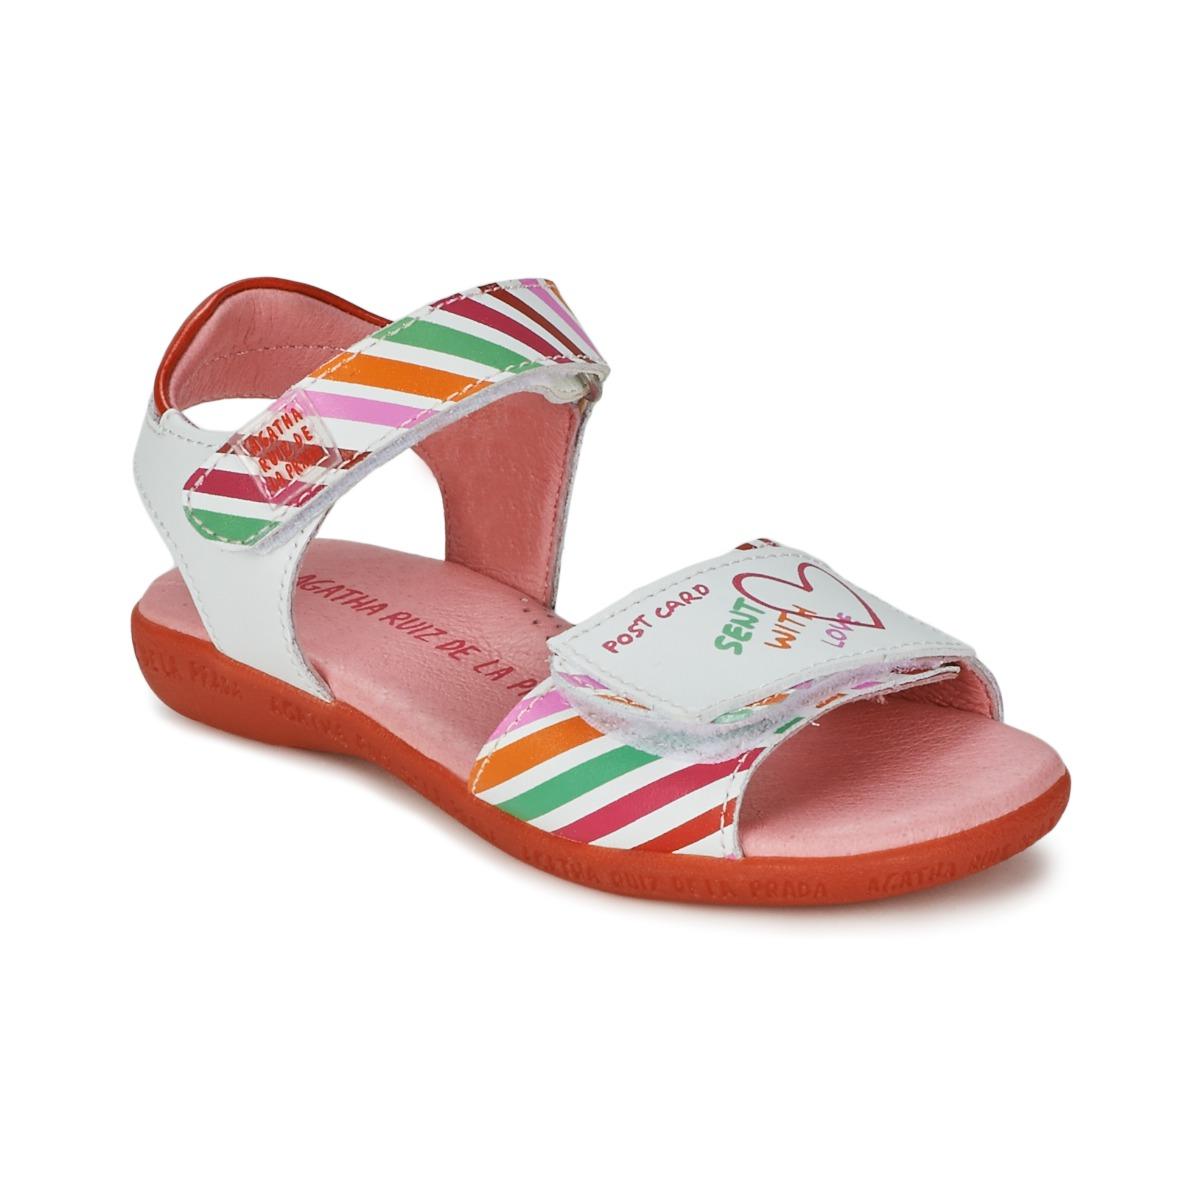 Sandale Agatha Ruiz de la Prada CAZOLETA Blanc / Multicolore